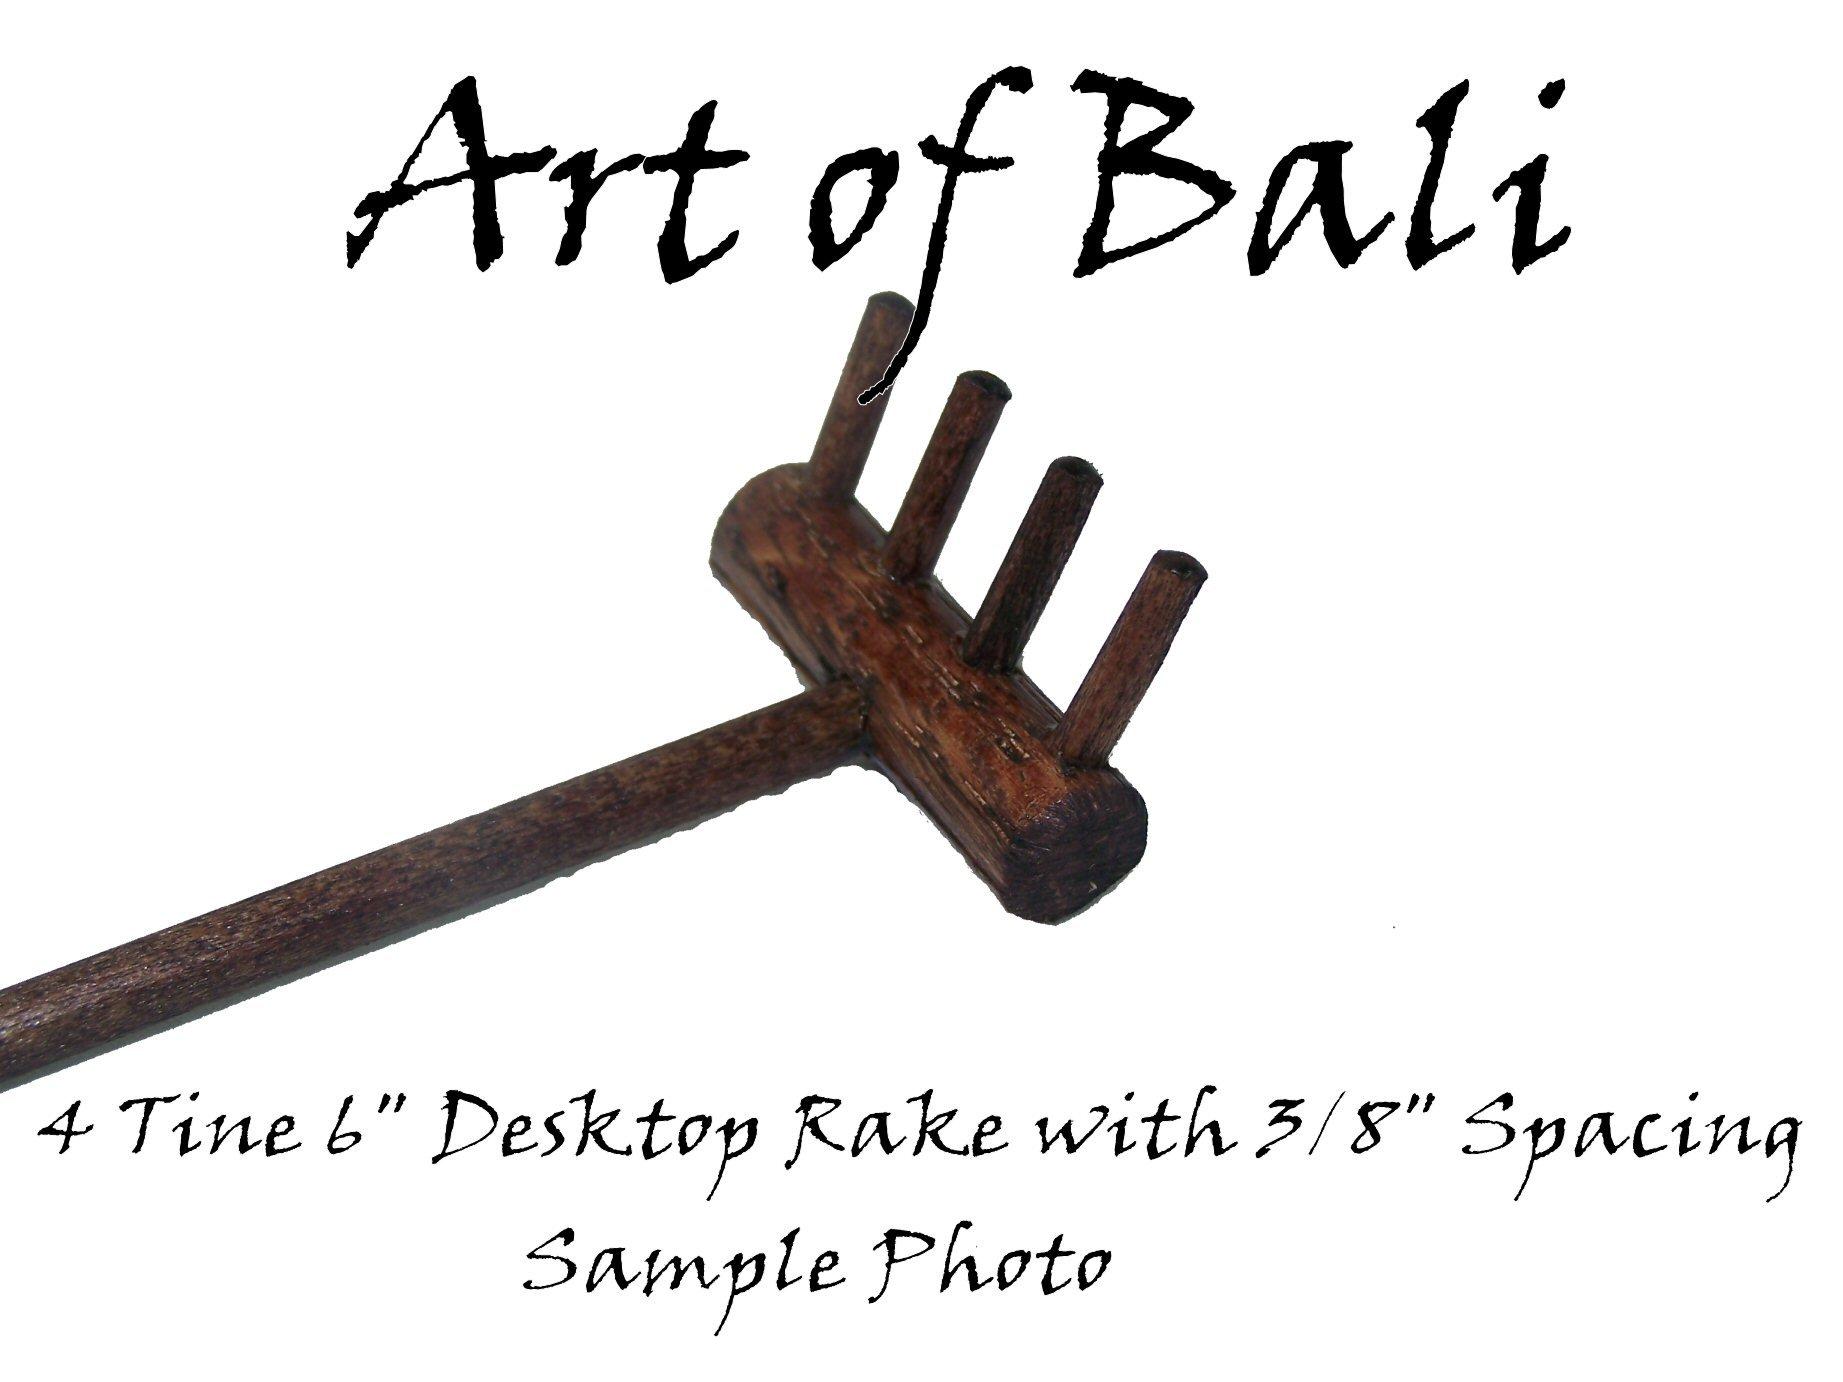 Art of Bali Zen Garden Rake 50 Pack Four Tine Desktop Rake - Zen Gardens by Art of Bali